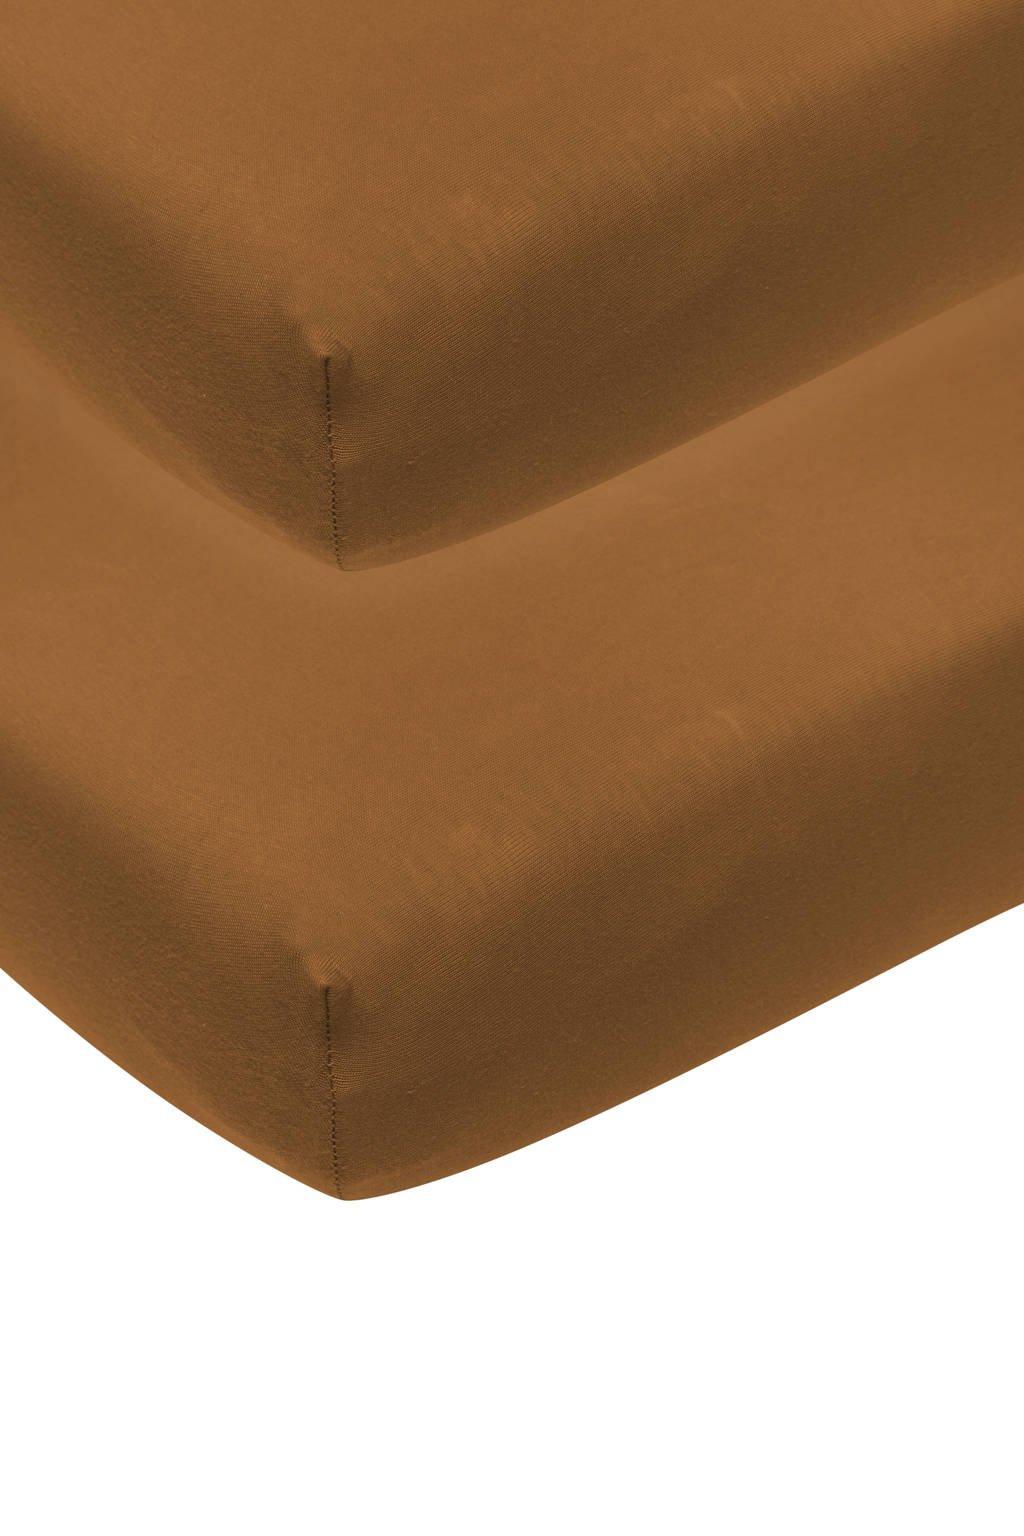 Meyco katoenen jersey hoeslaken wieg - set van 2 50x90 camel Camel